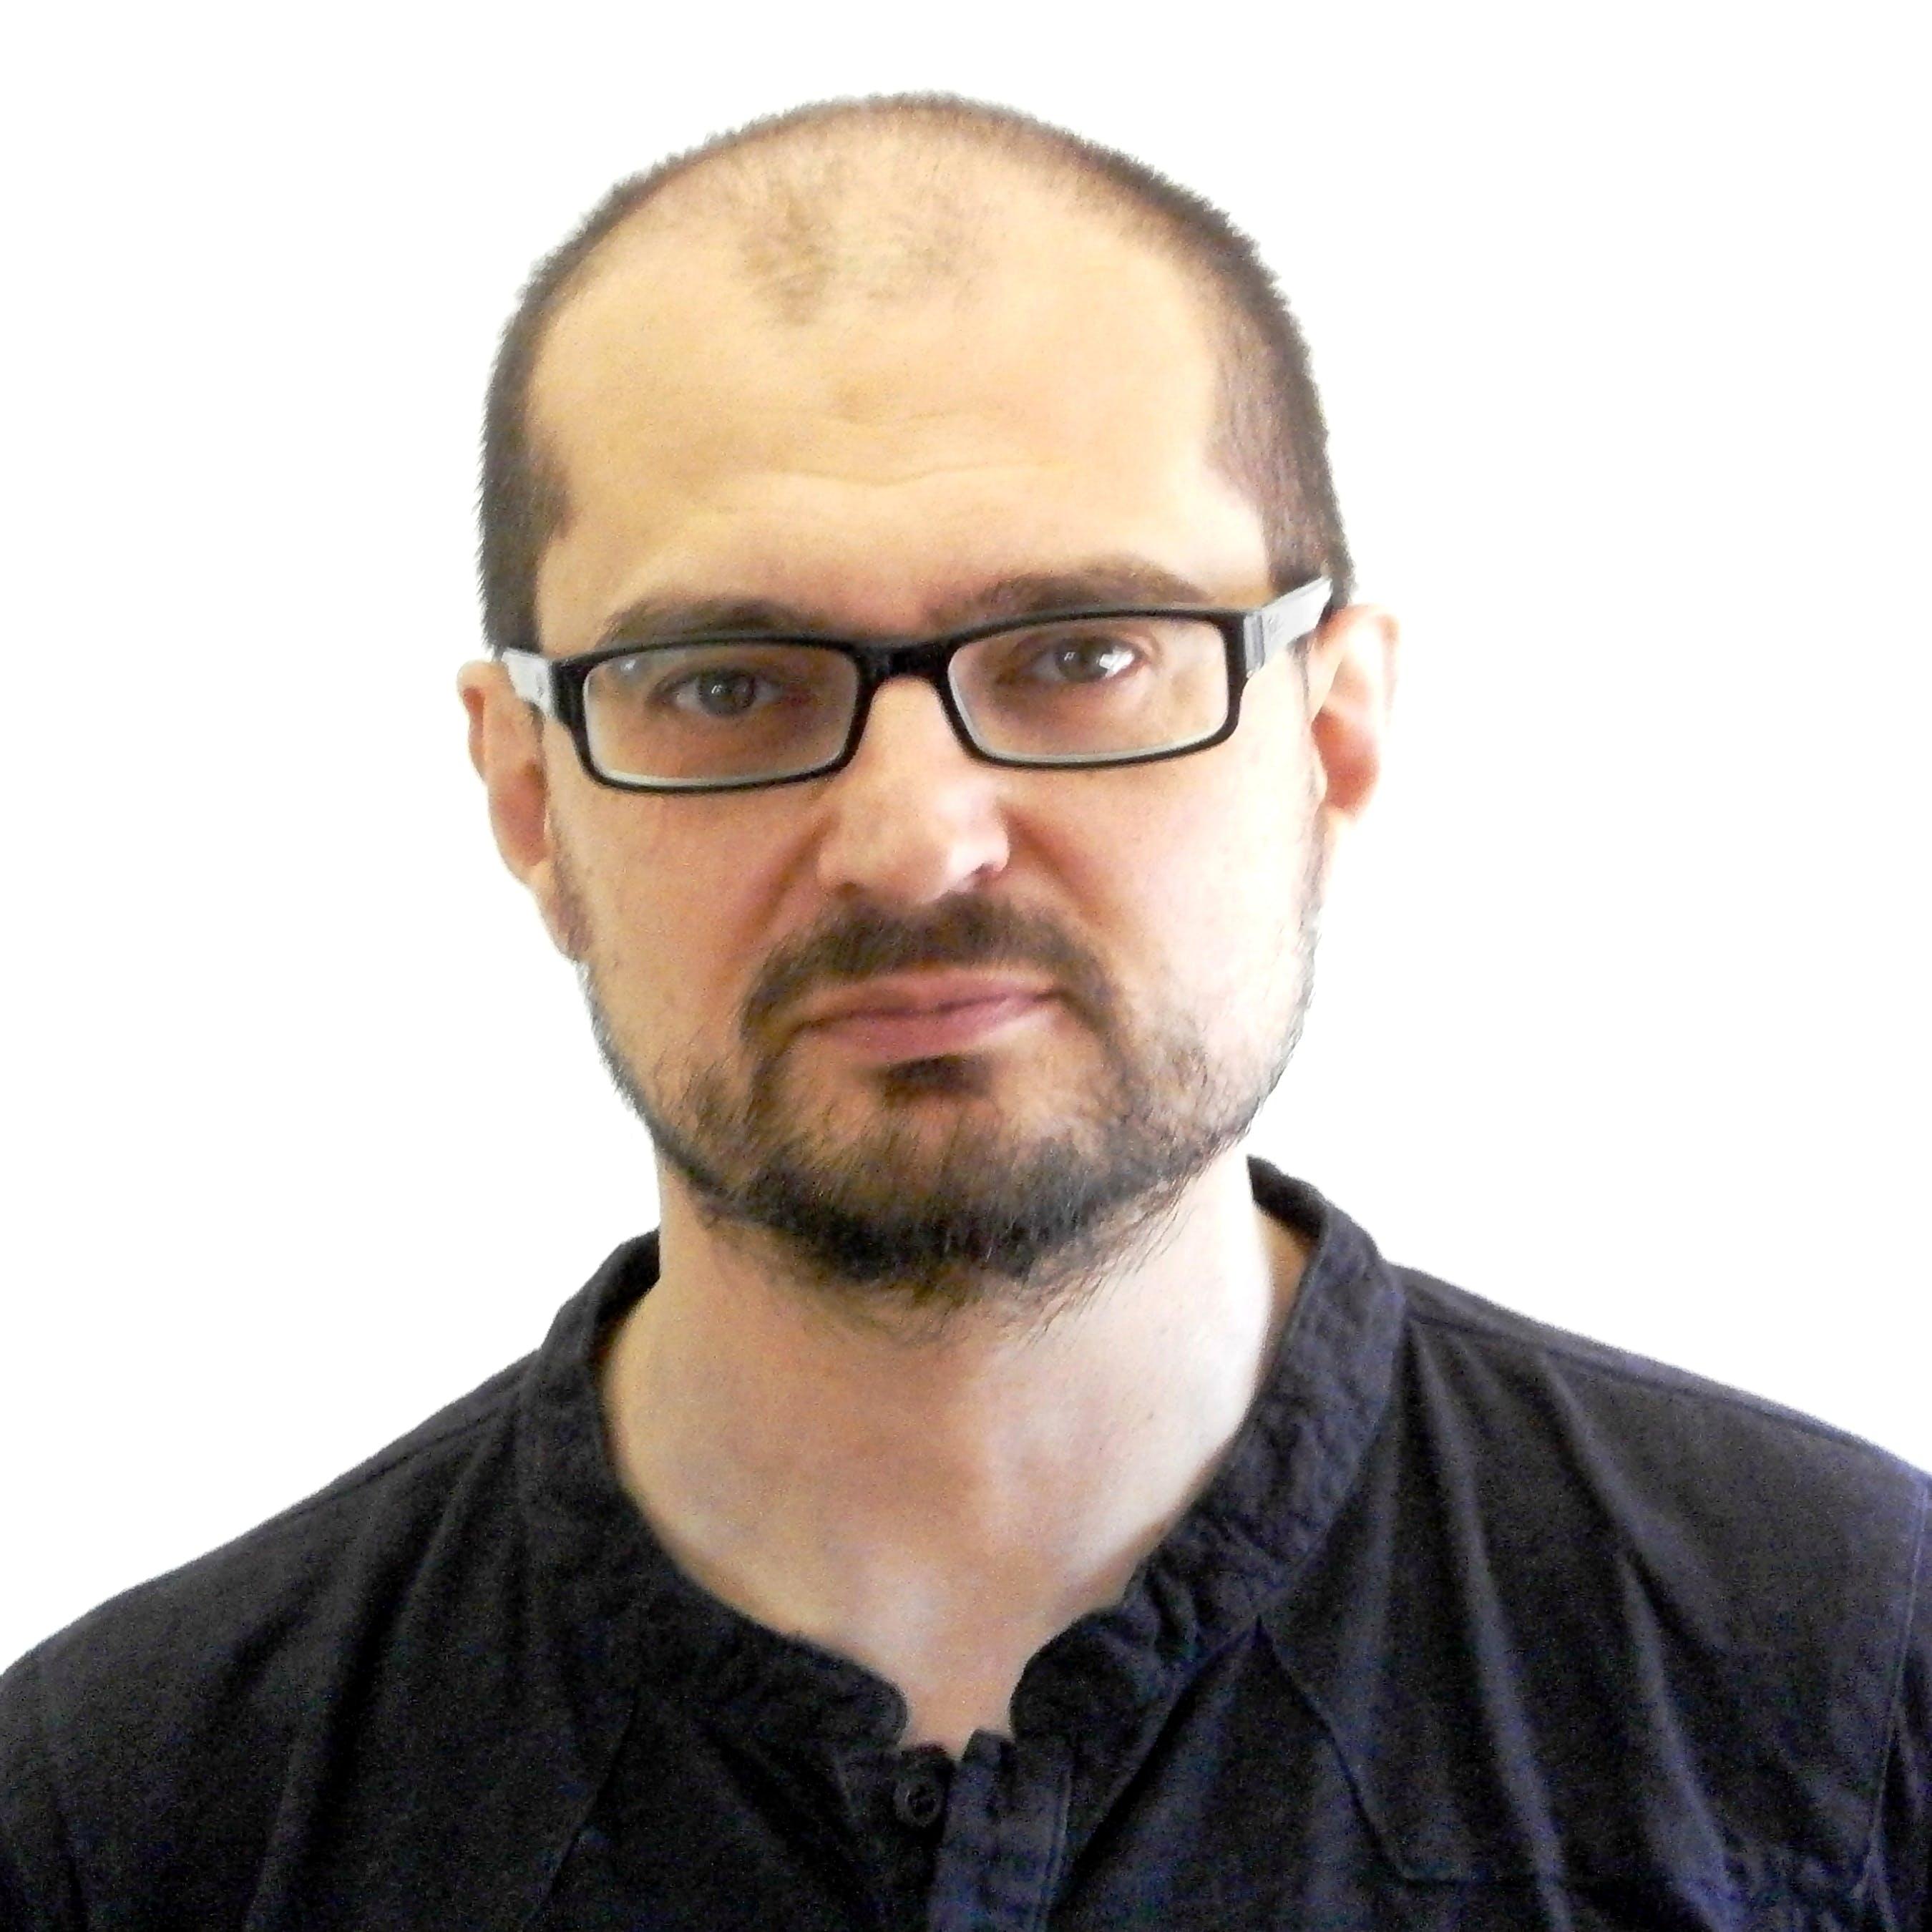 Antonio López Peña